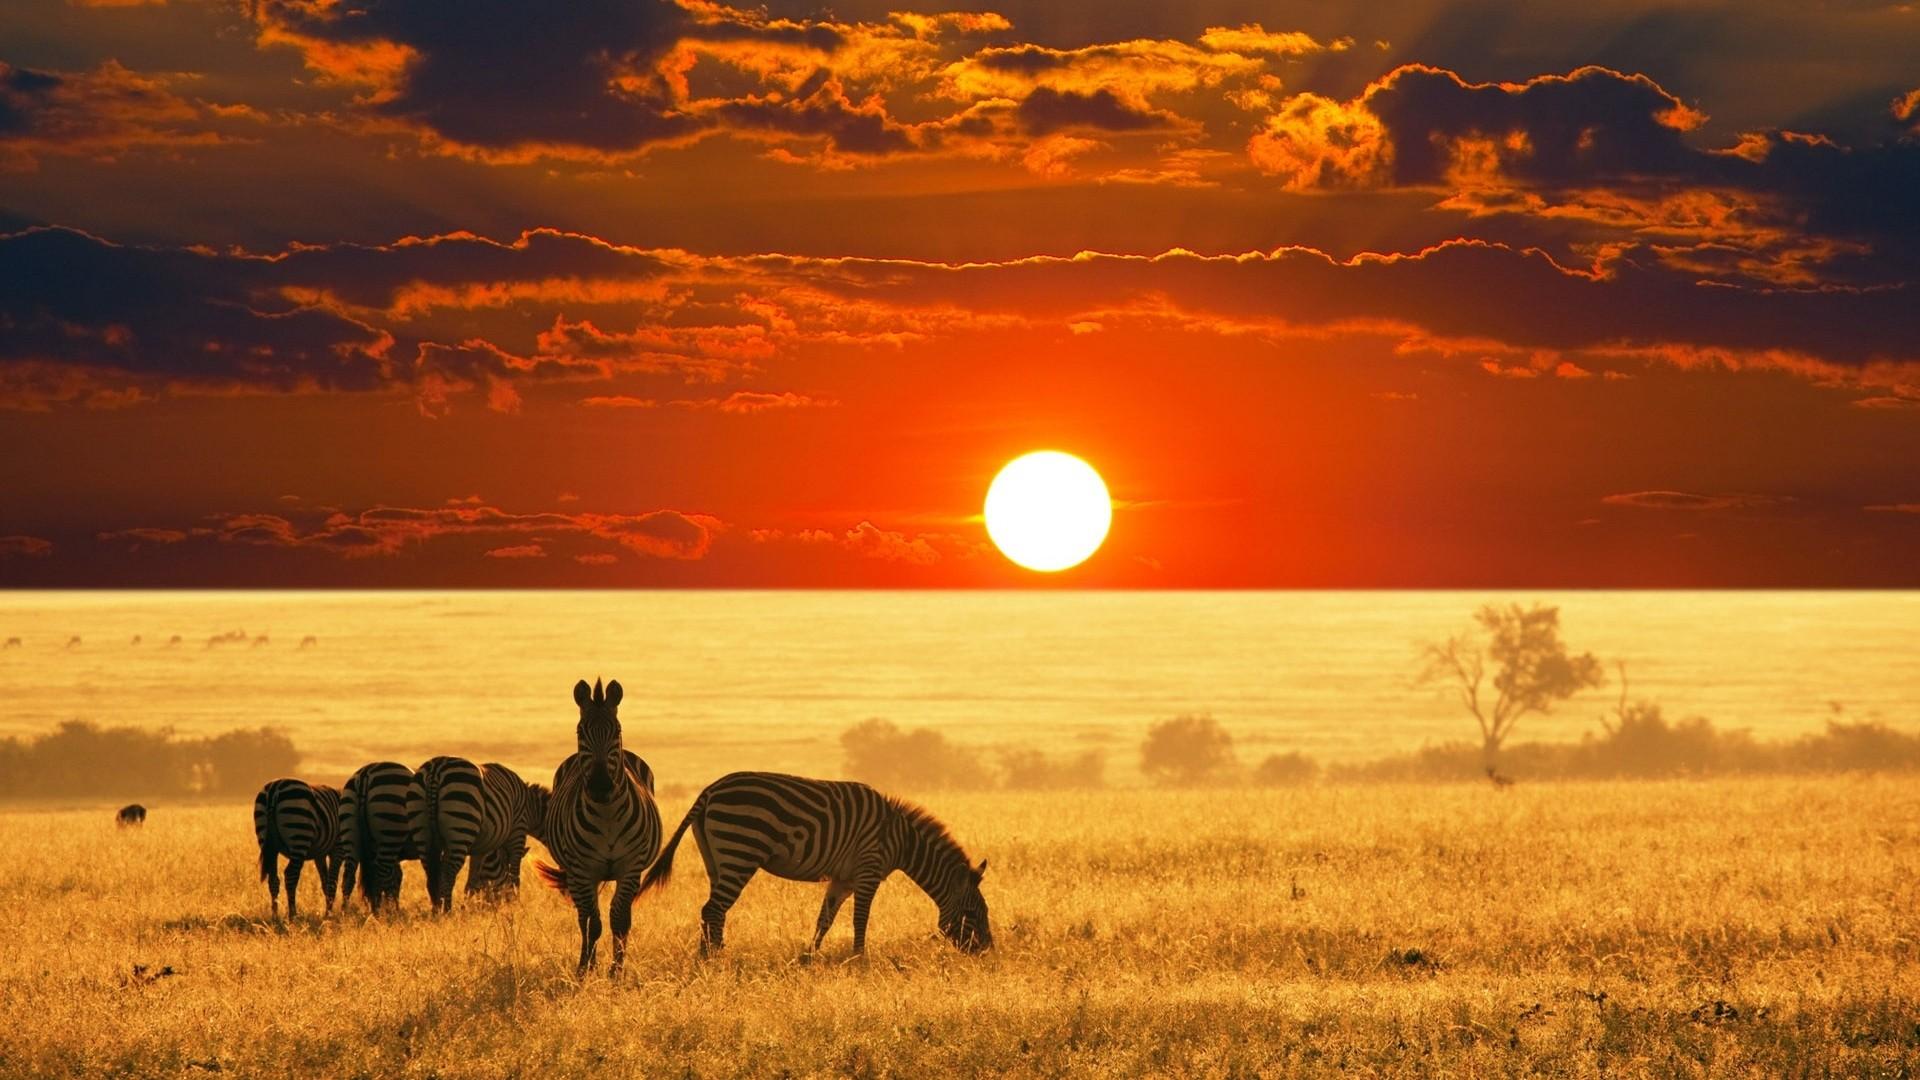 African-safari-animals-wallpaper-HD